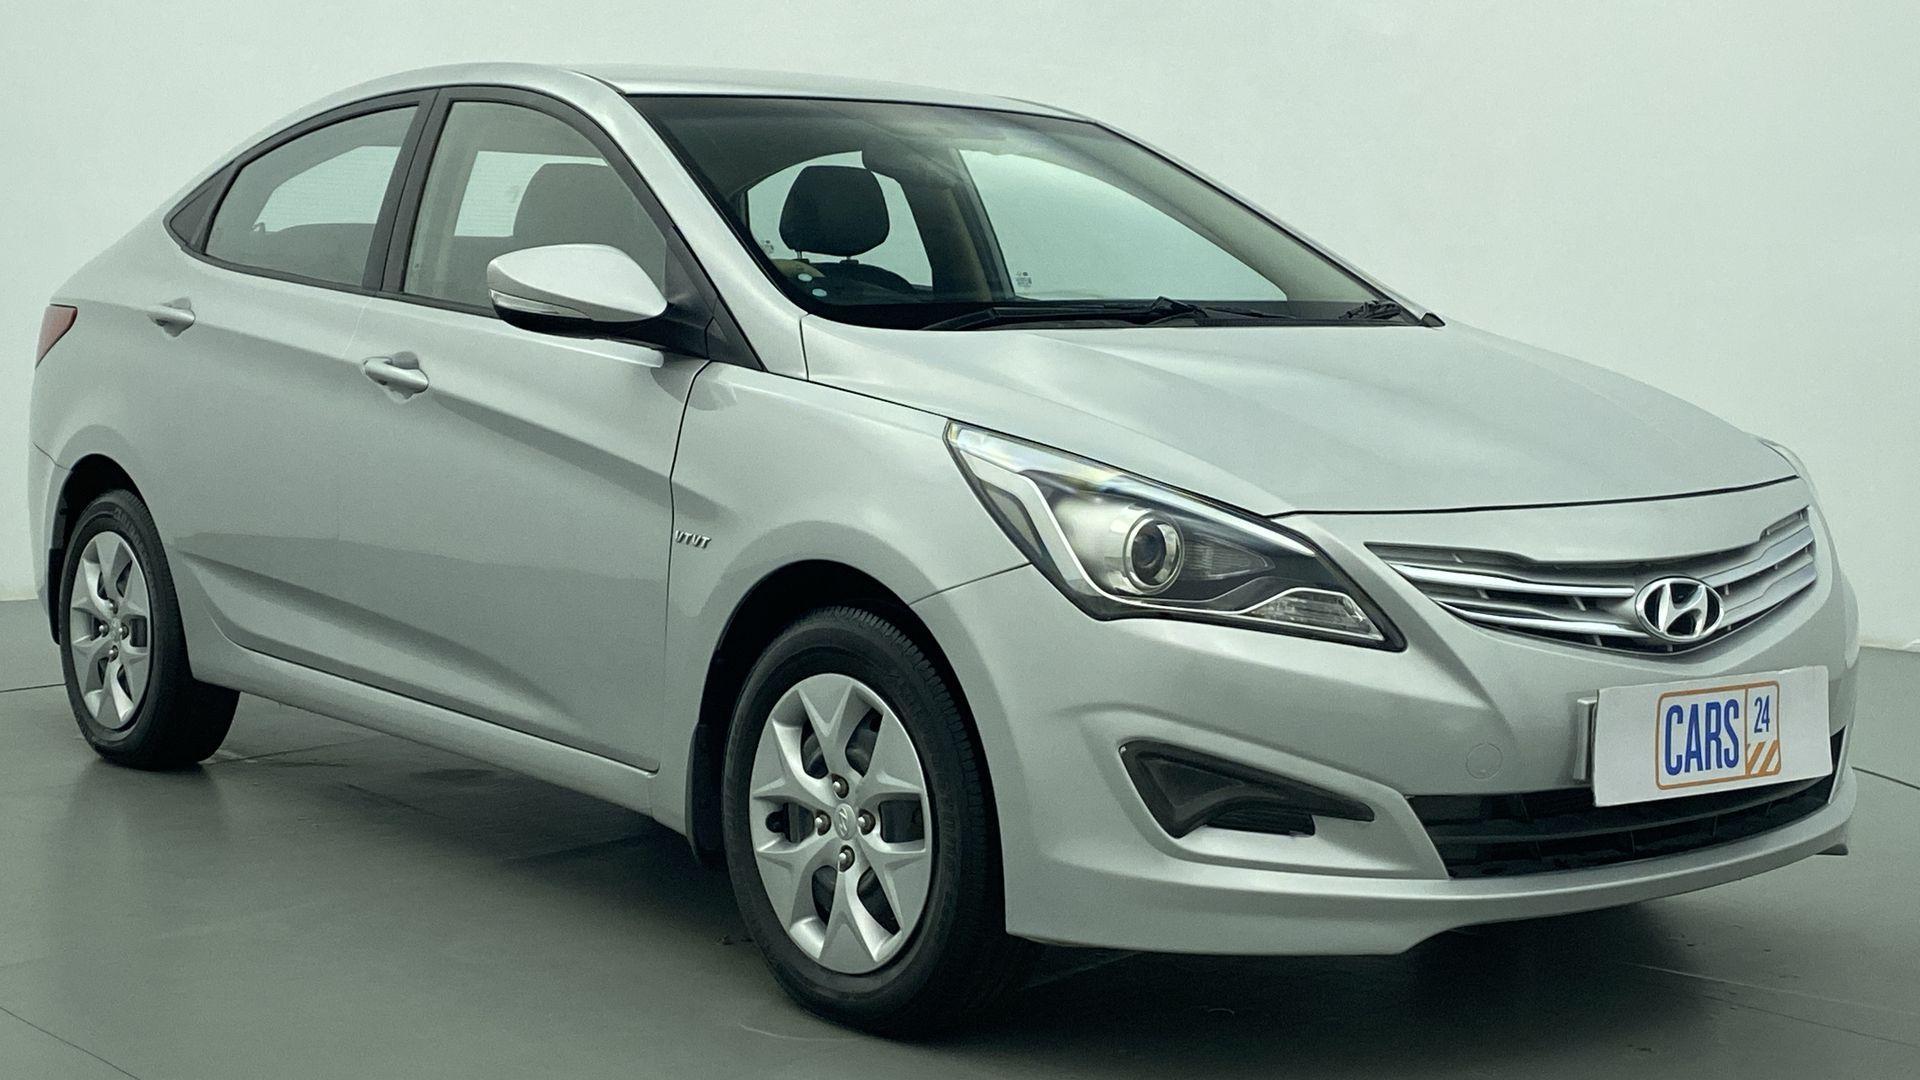 2016 Hyundai Verna FLUIDIC 1.6 VTVT S